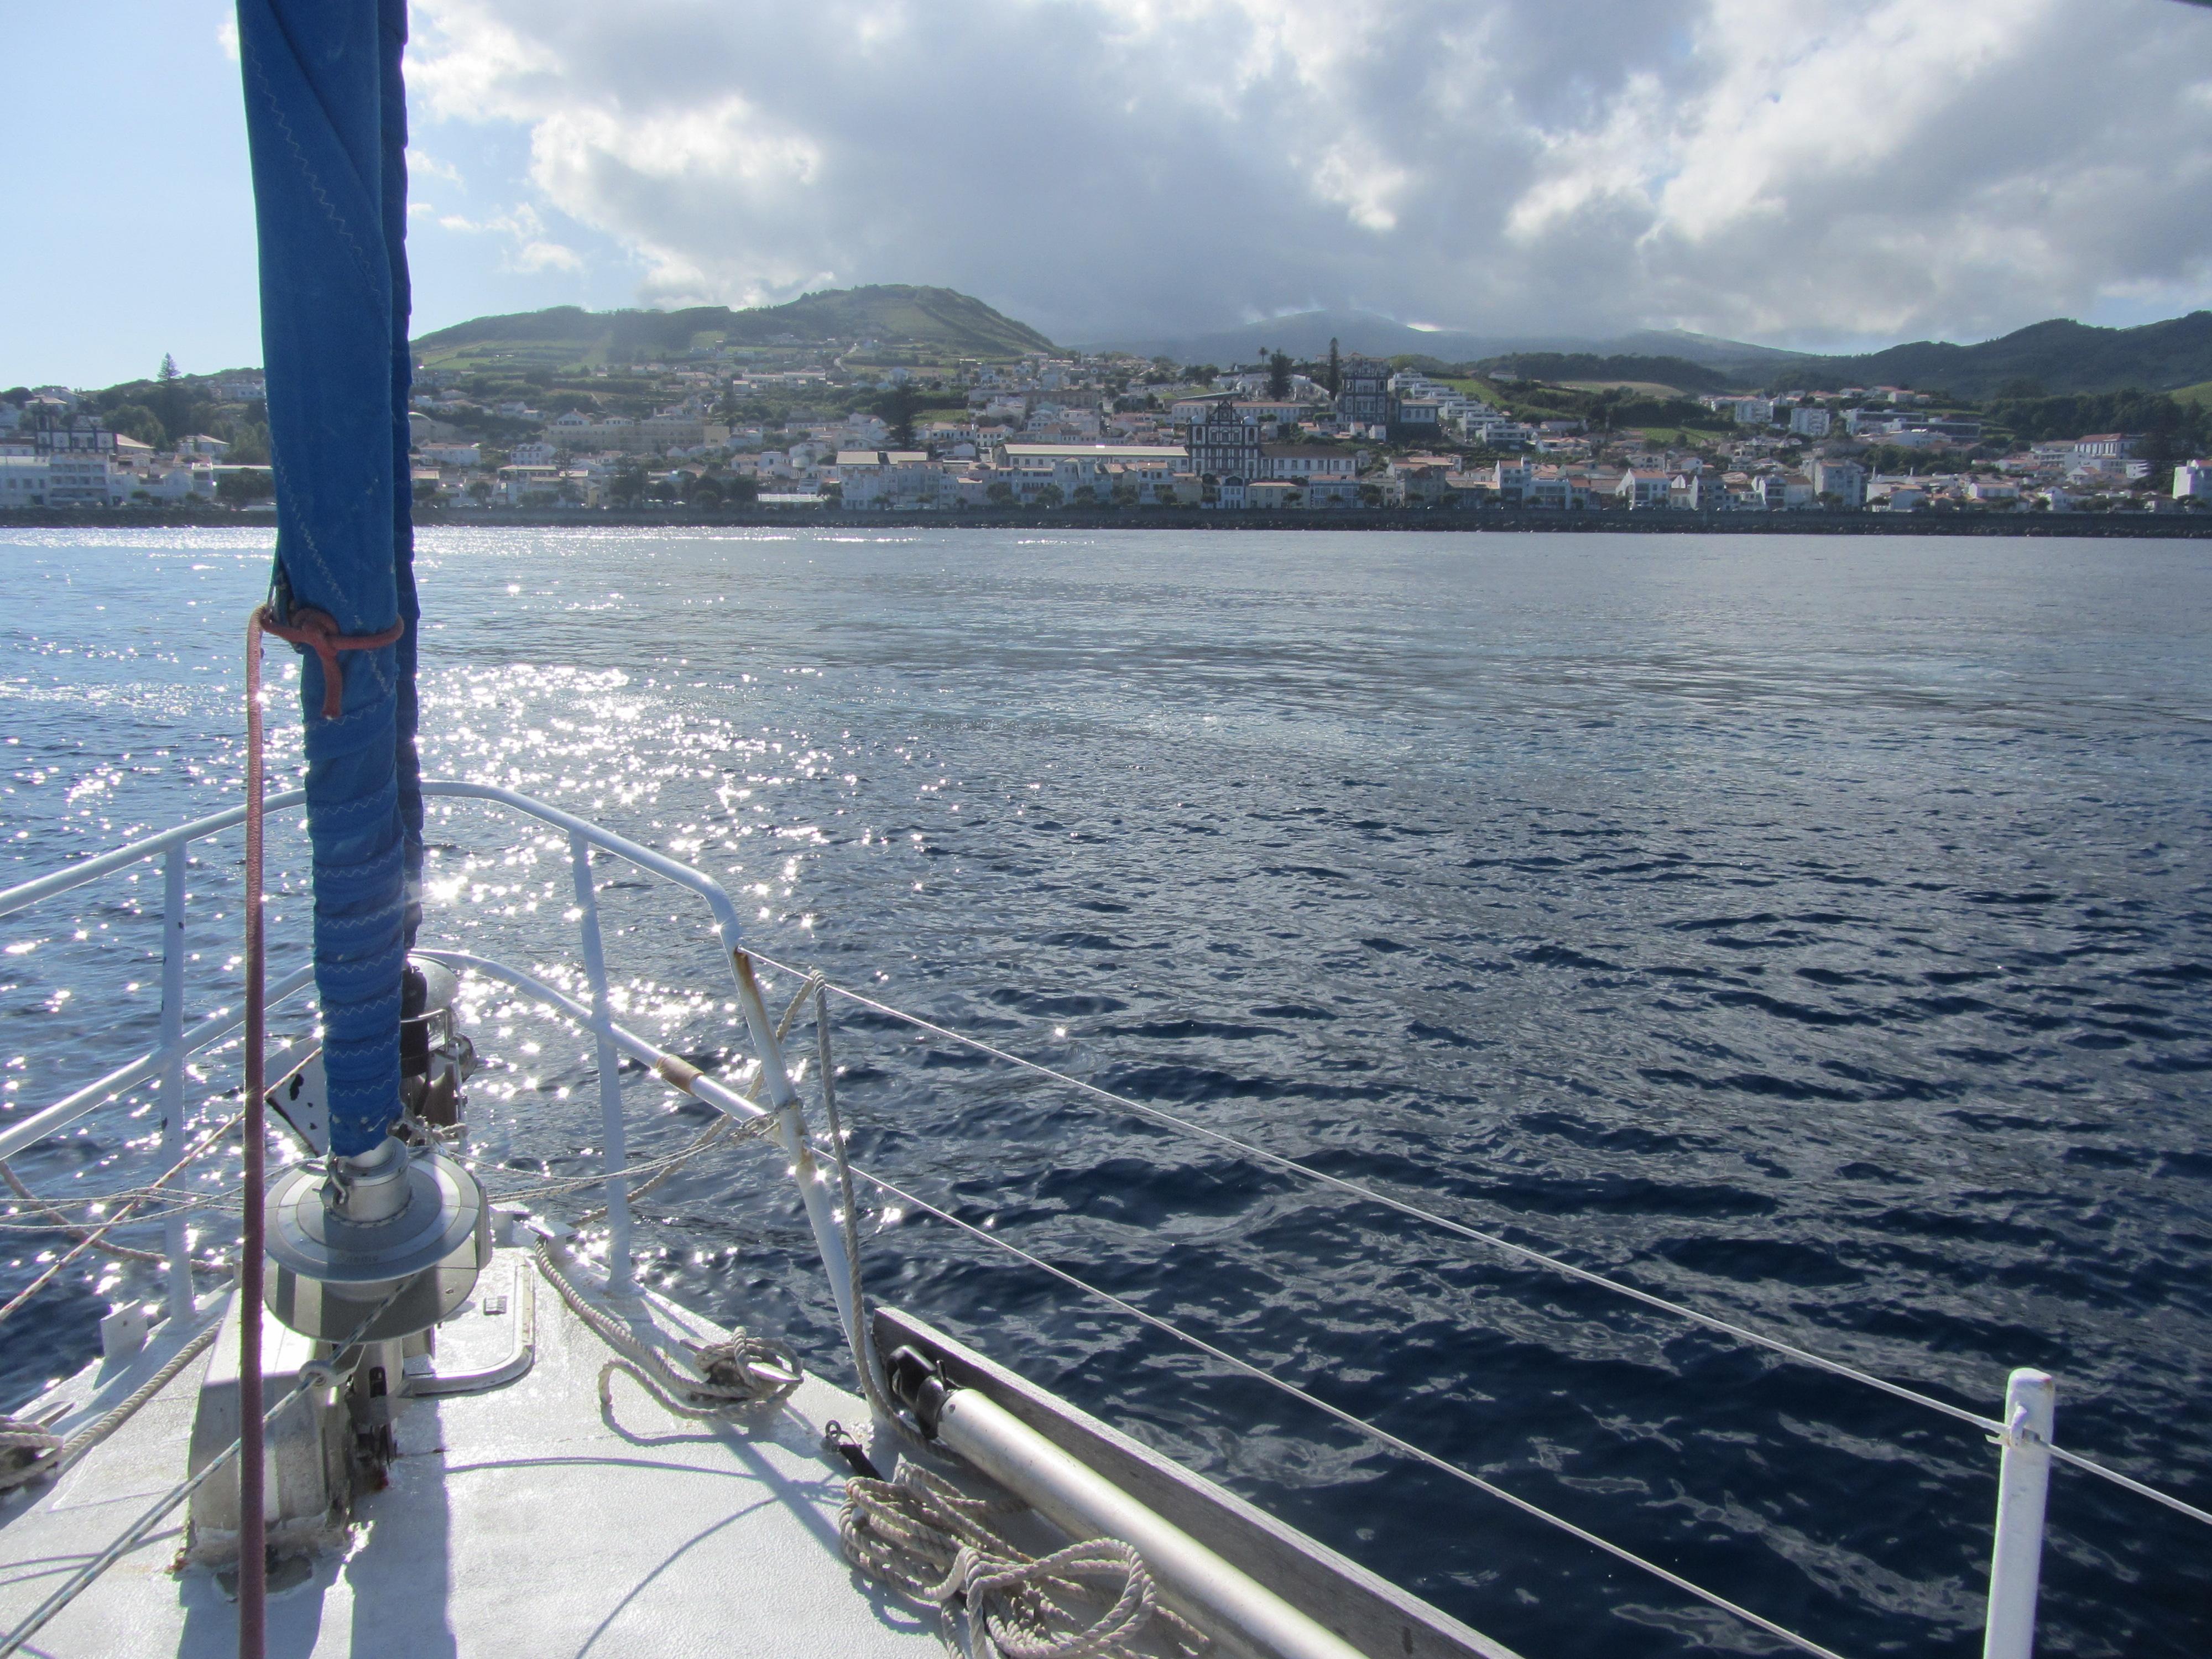 Arrivée sur Terceira